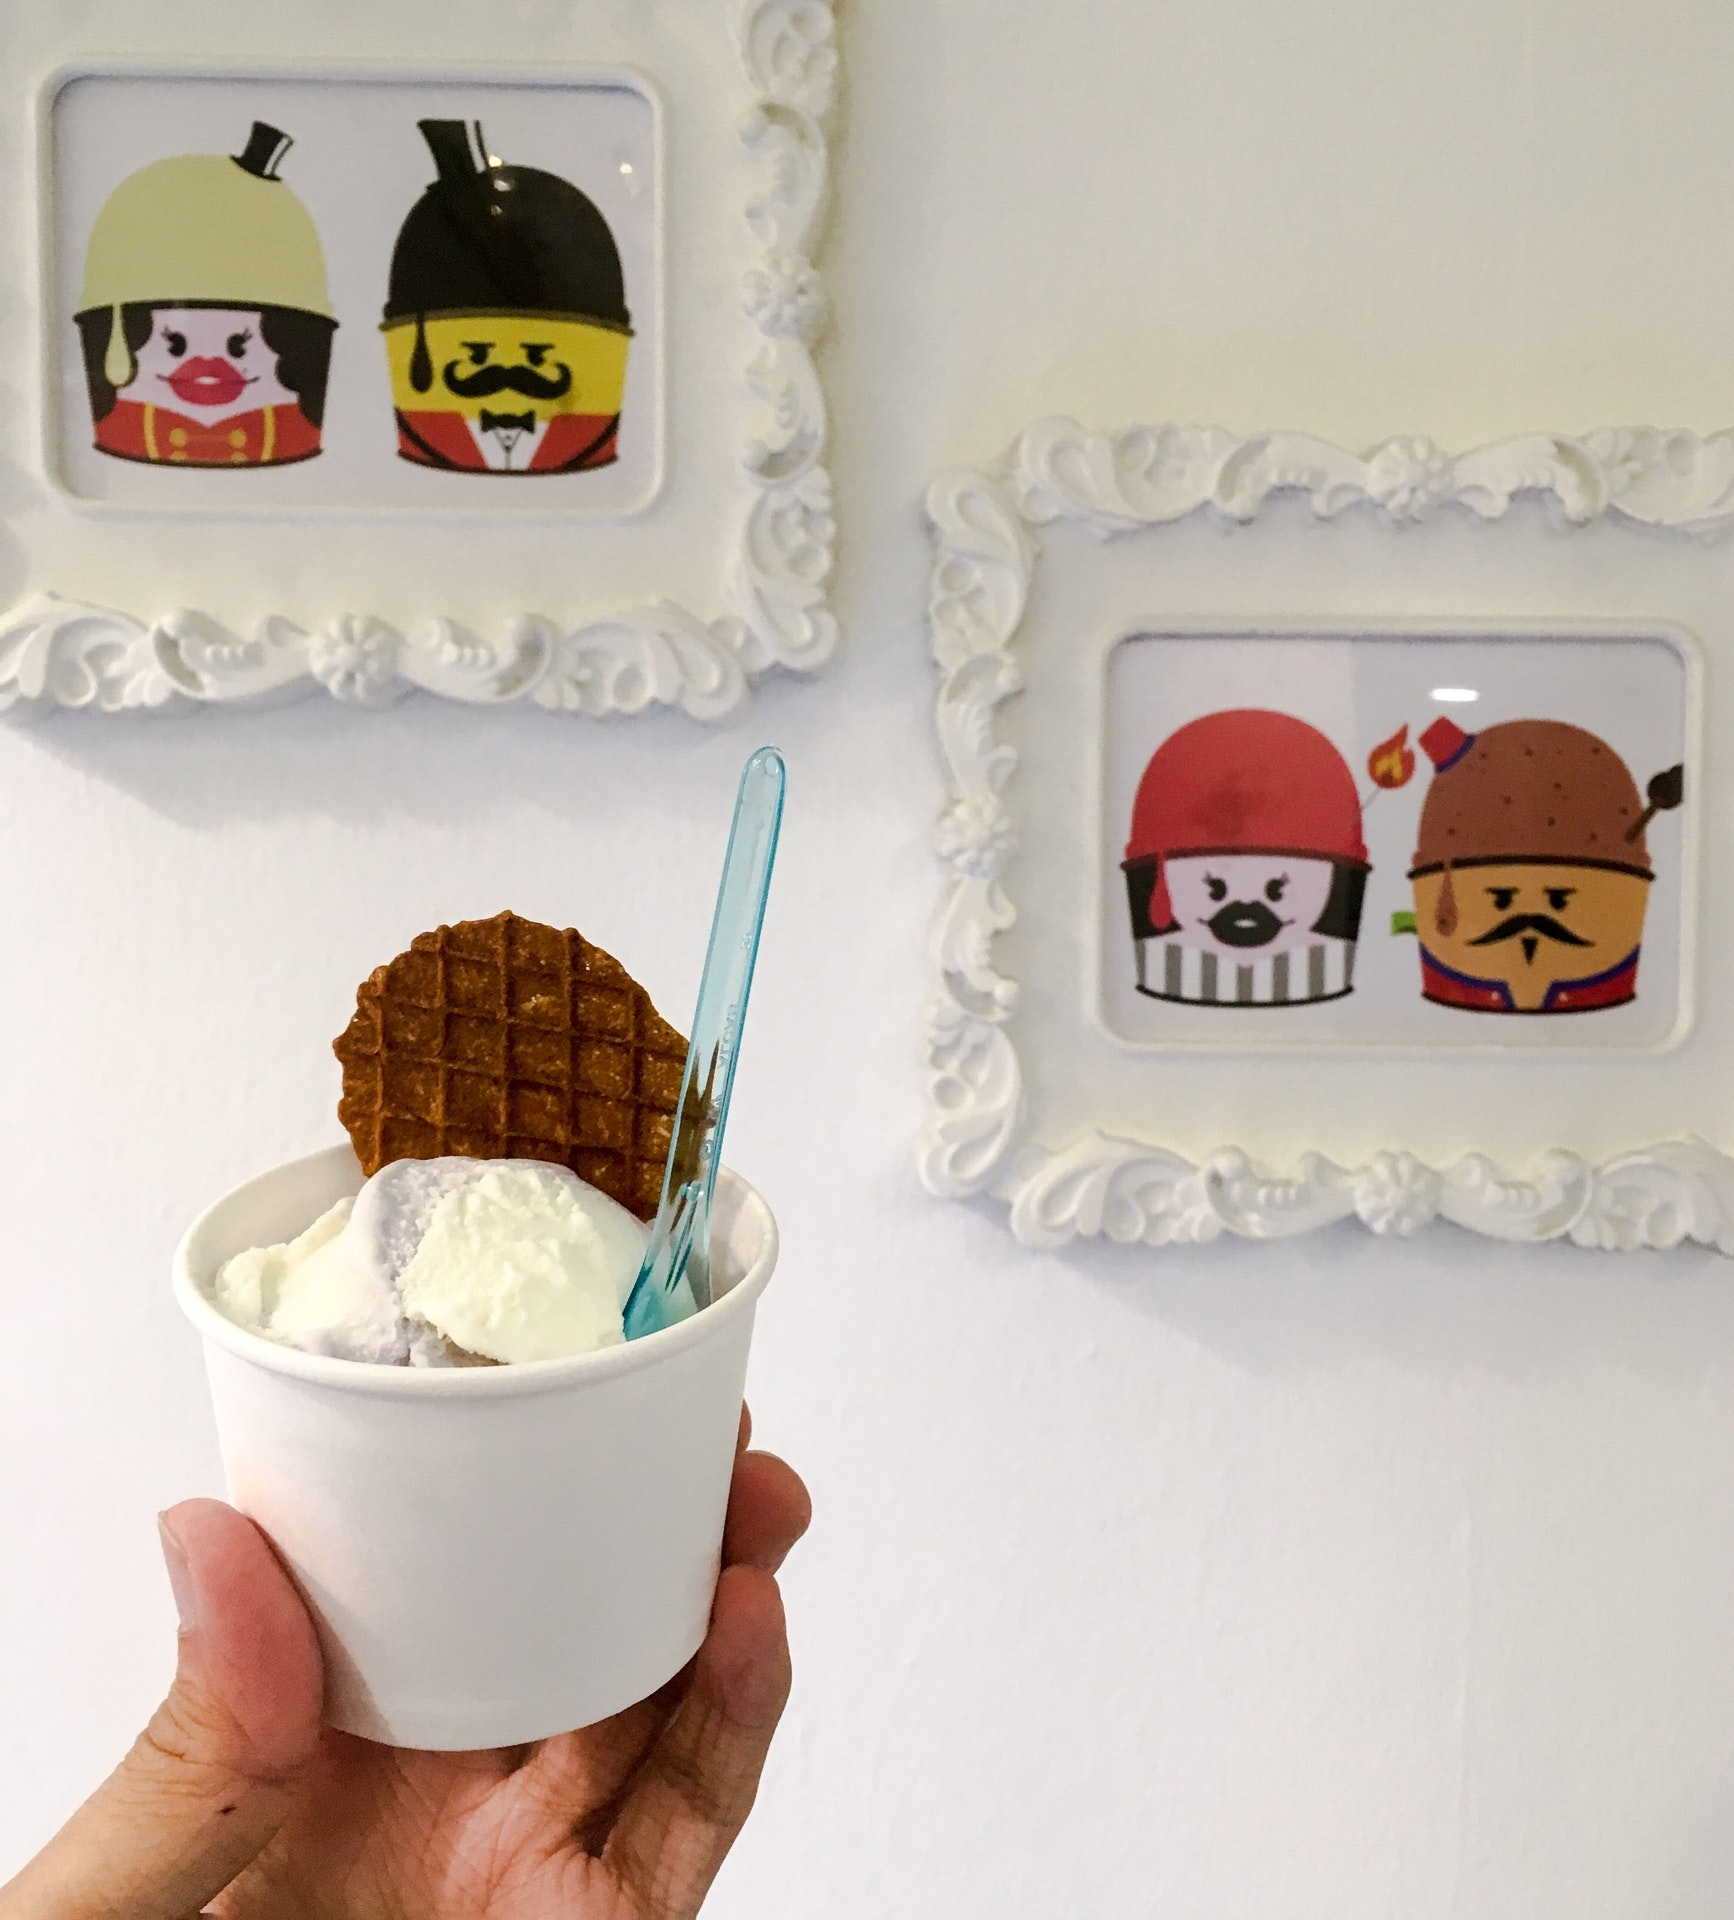 Ice-Cream Man And Friends